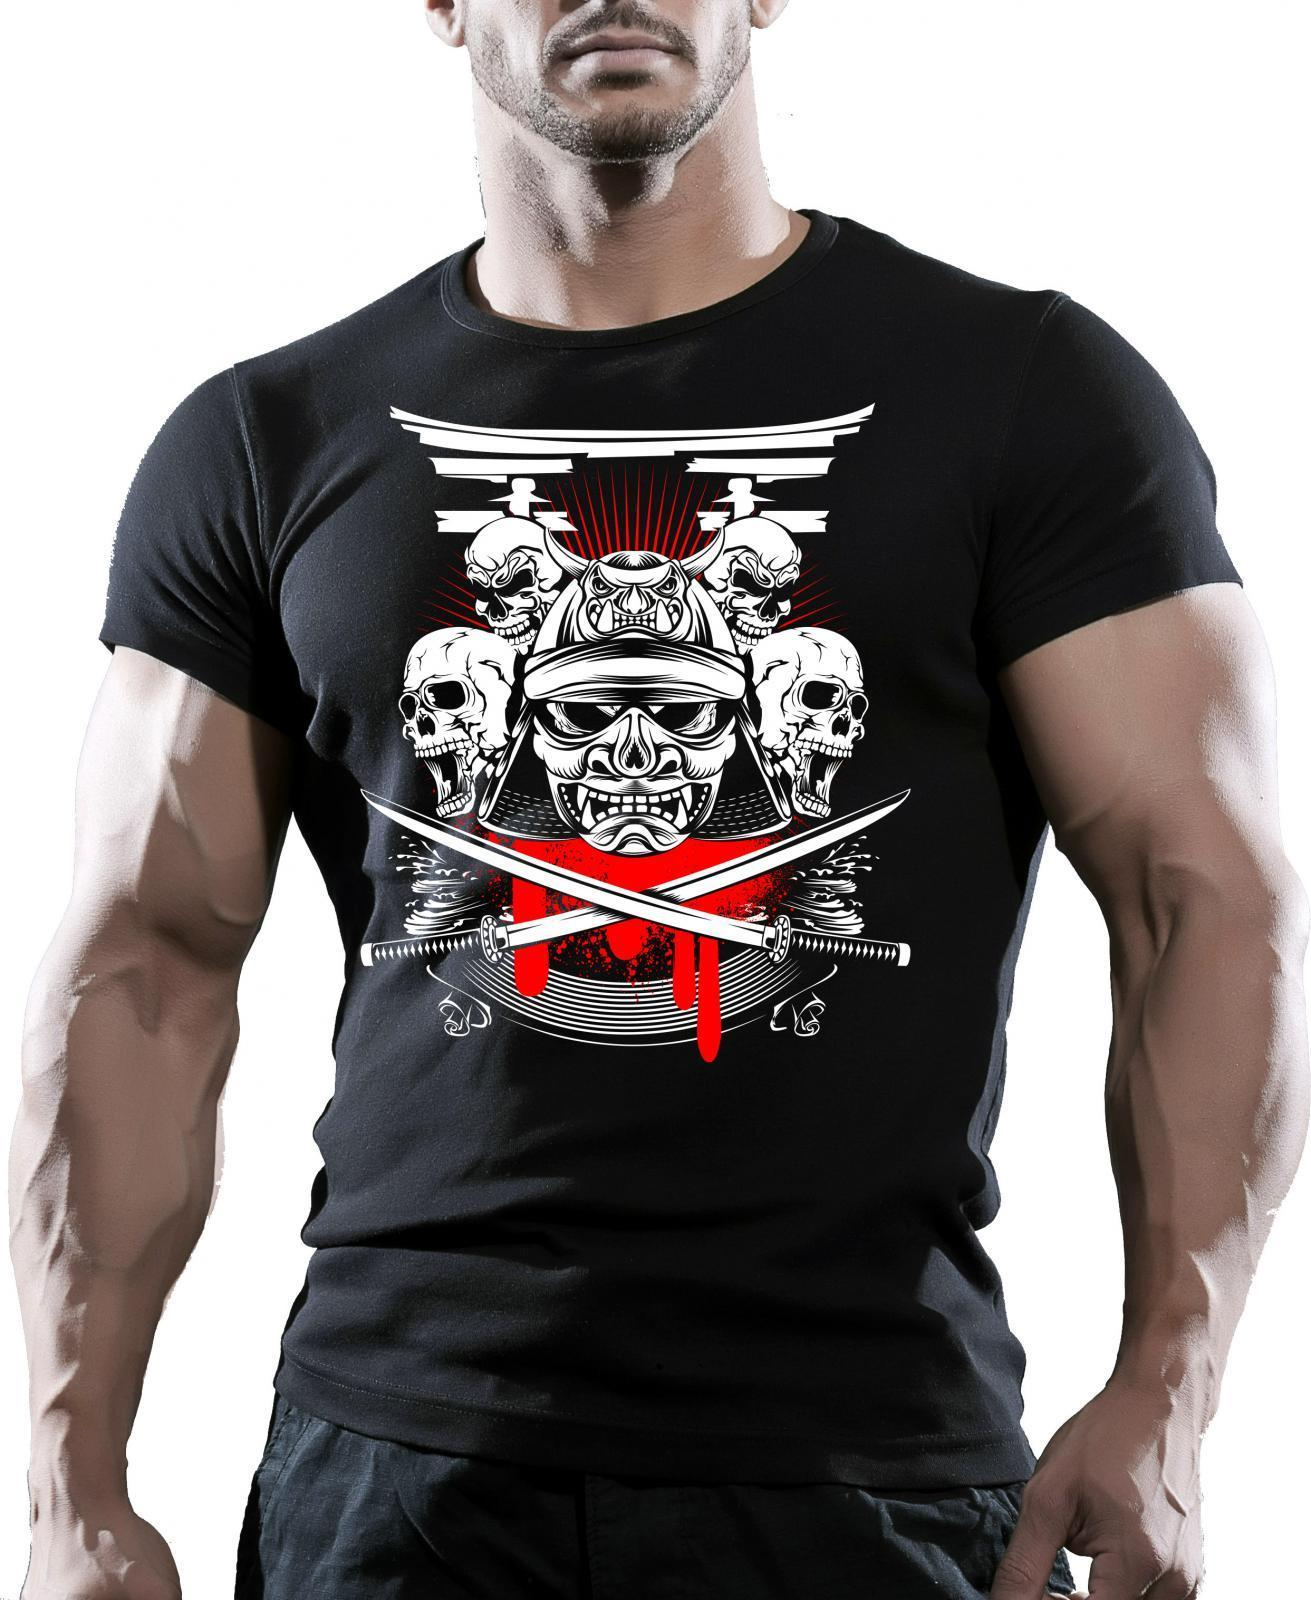 SAMURAI TESTA Uomo Palestra Bodybuilding T-Shirt Workout Vestiti Allenamento Harajuku Co ...